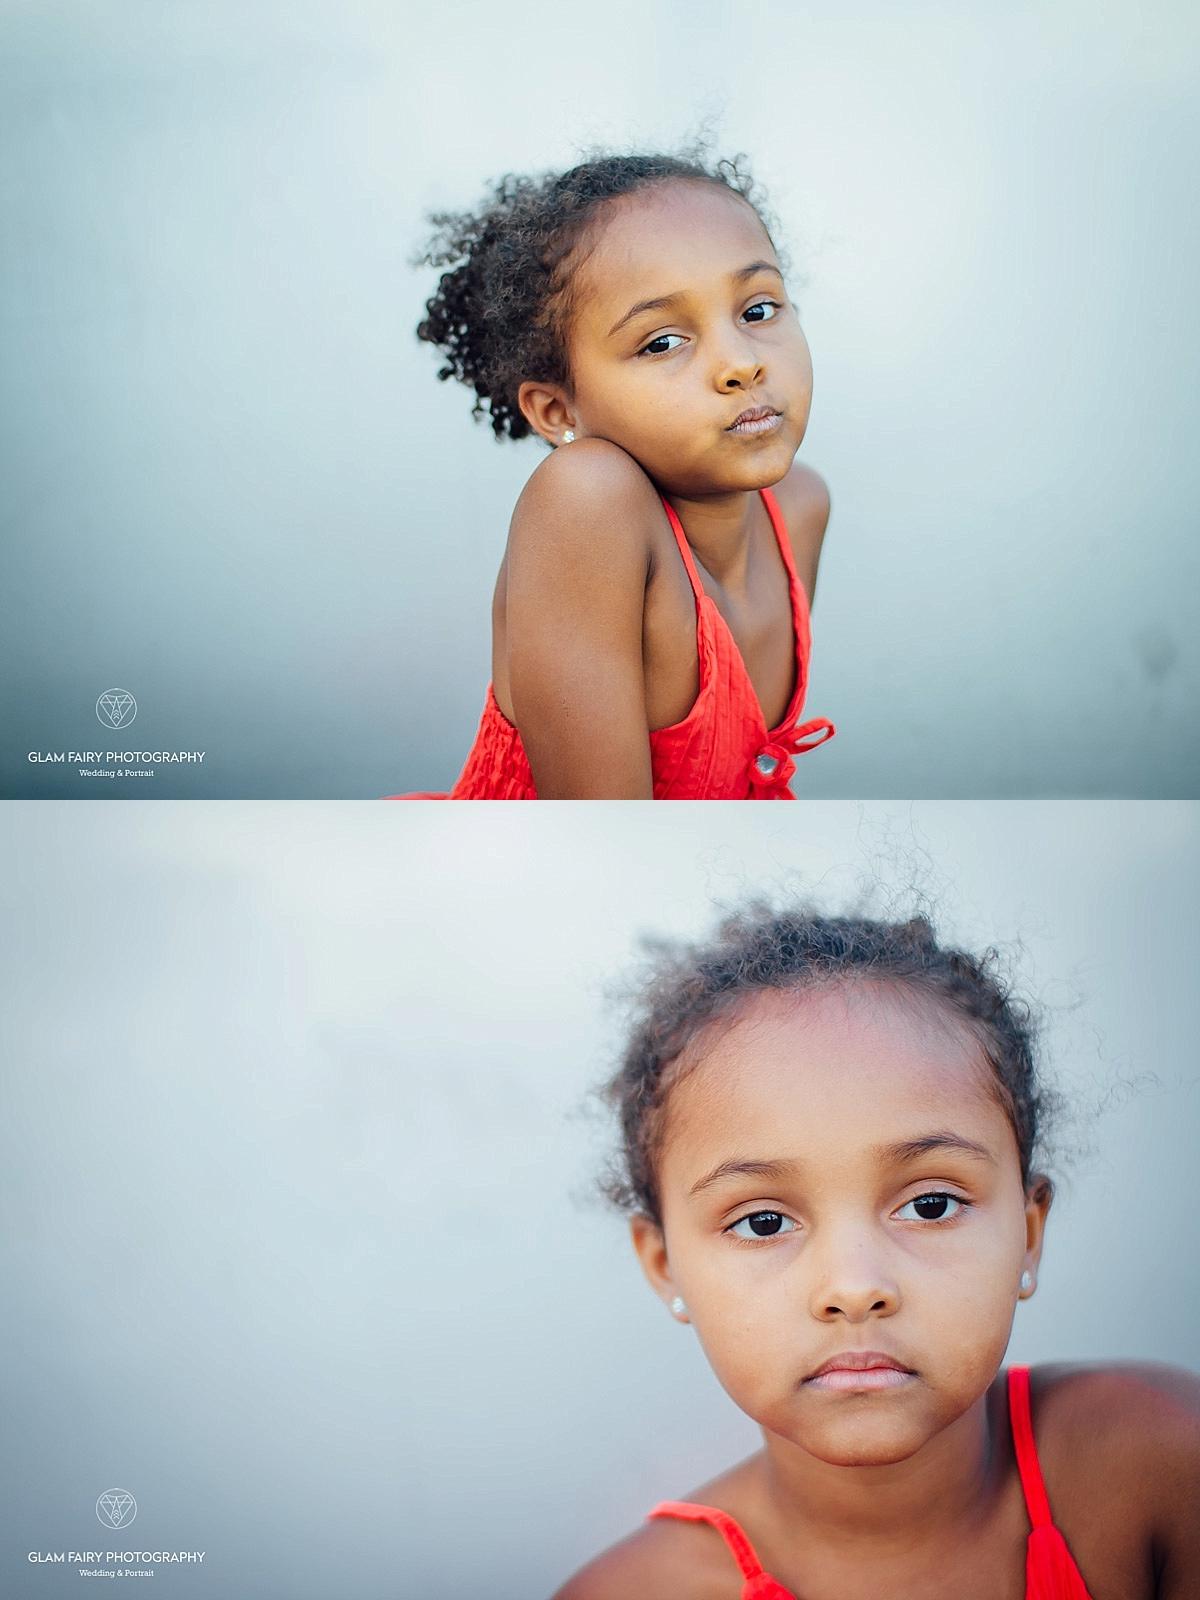 GlamFairyPhotography-séance-photo-enfant-bnf-yaelle_0011